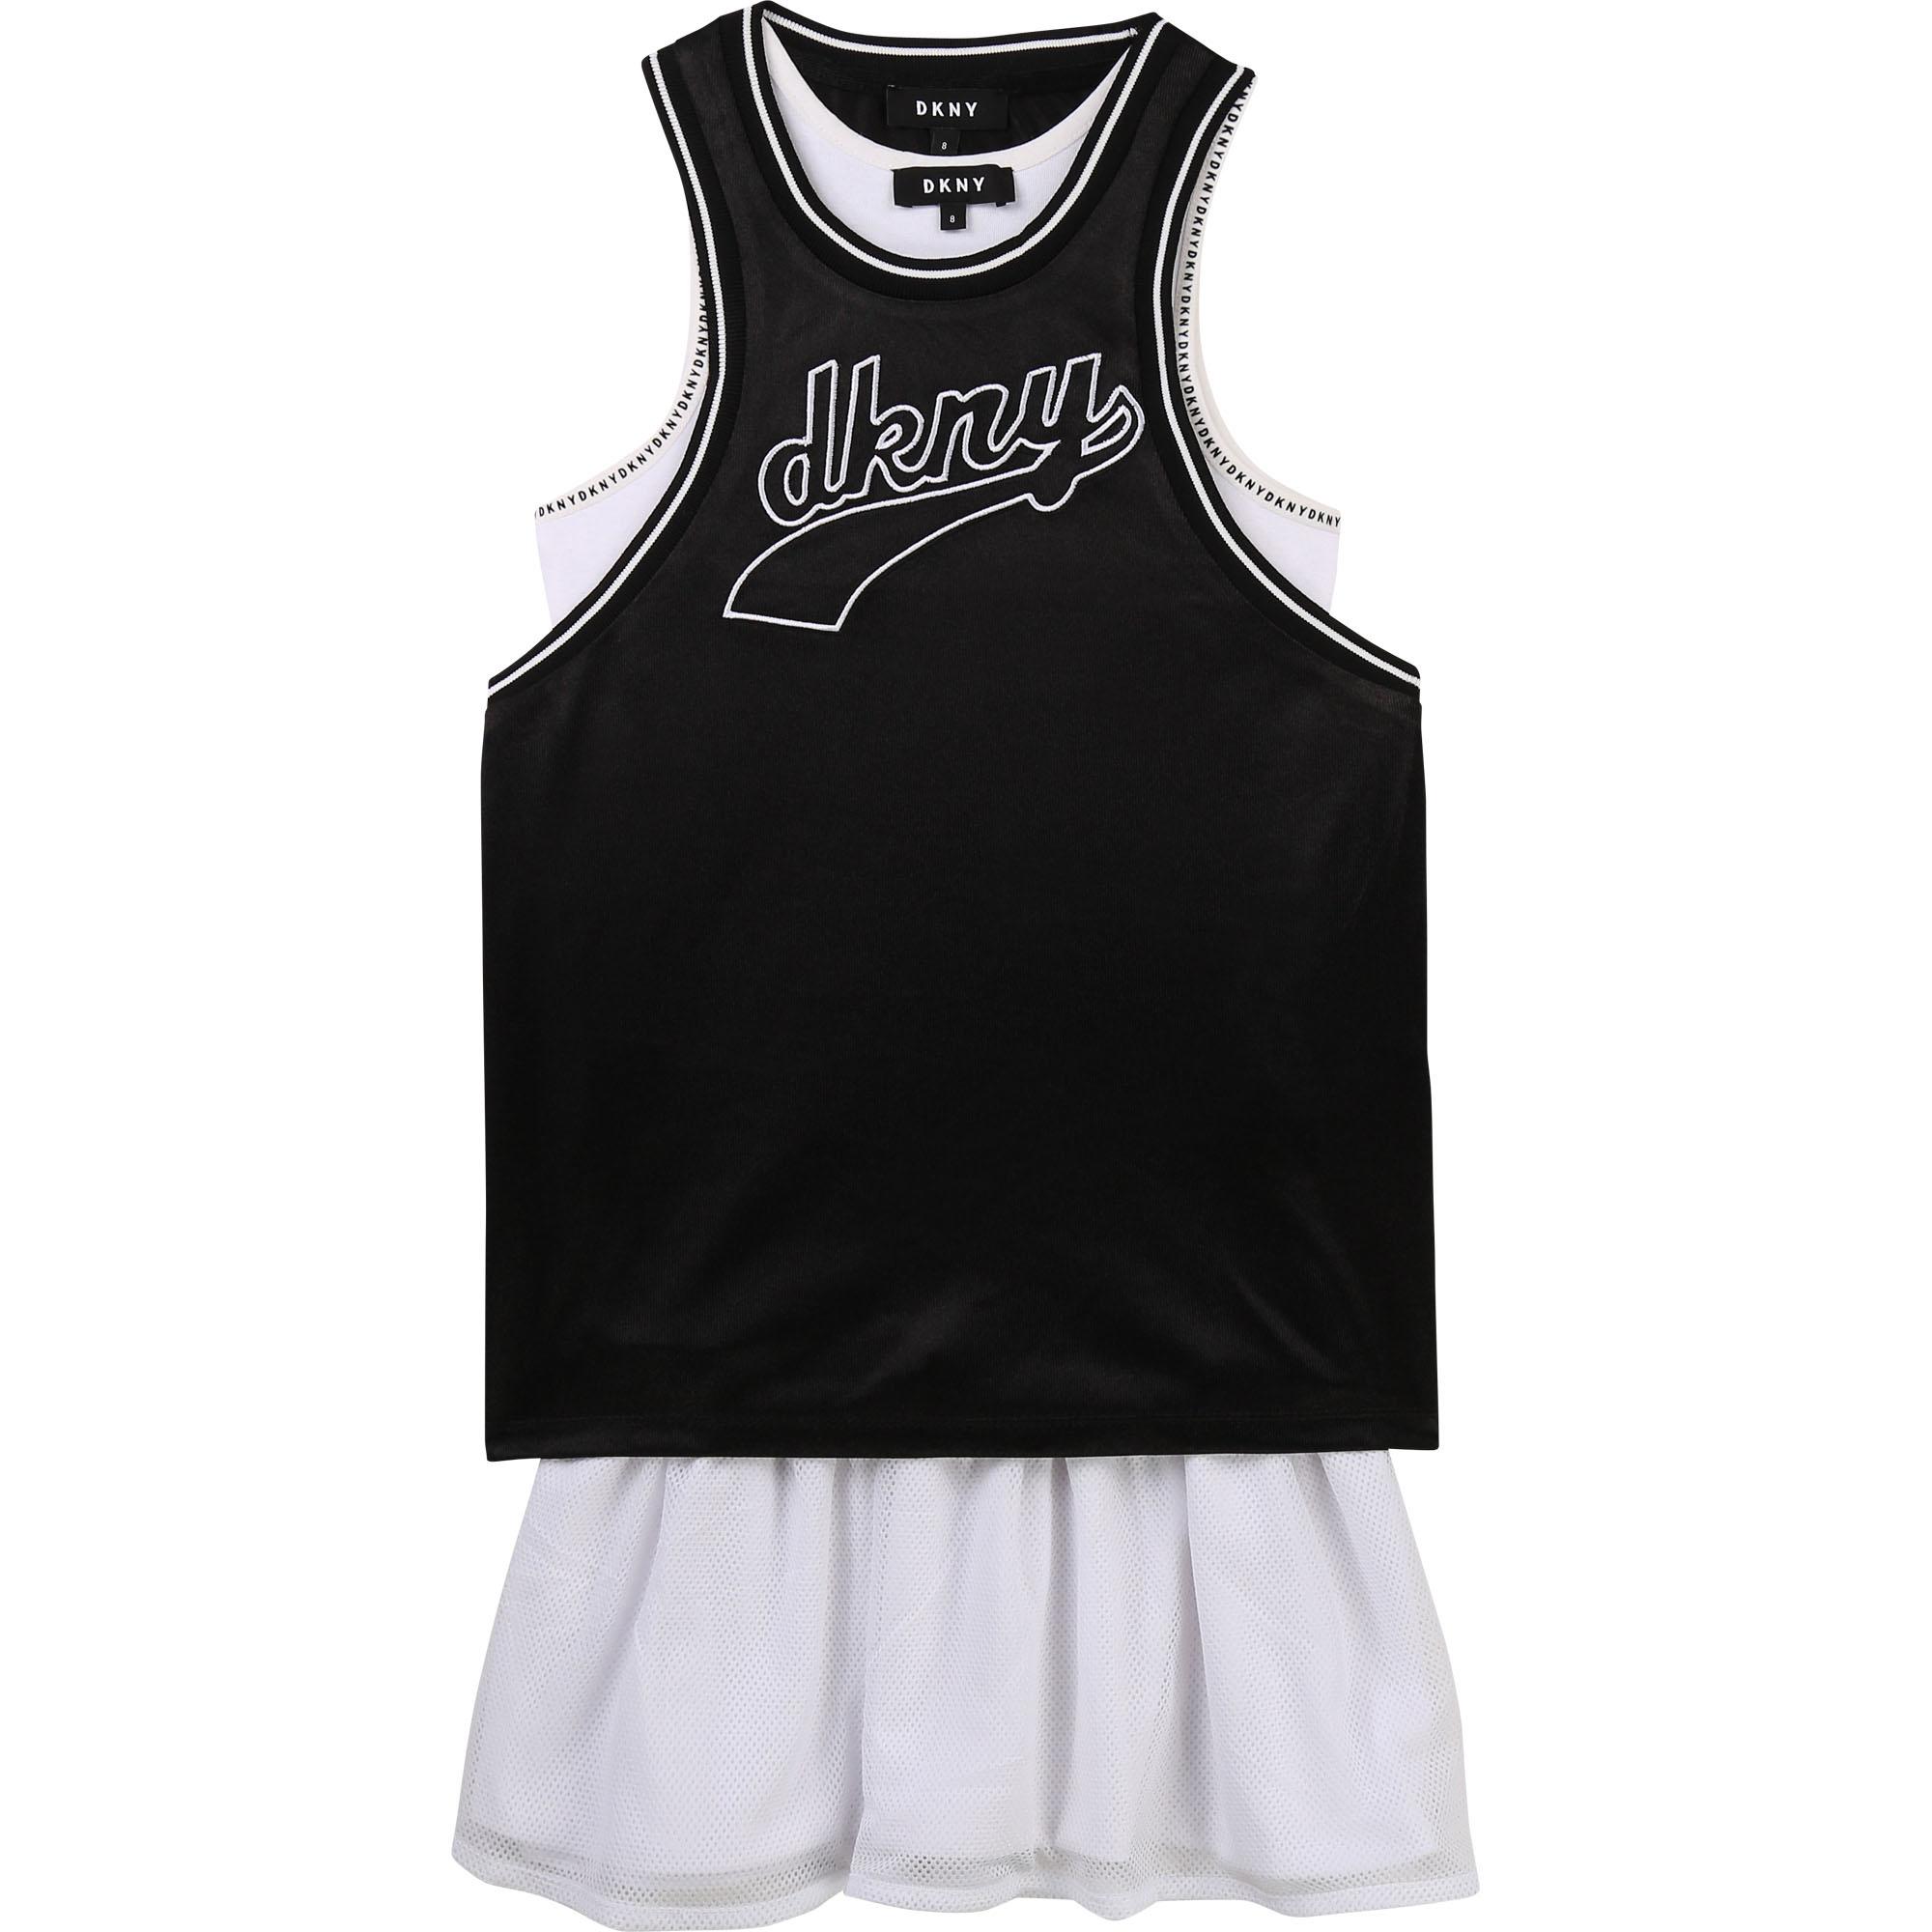 DKNY robe 2 en 1 avec patch brodé-1